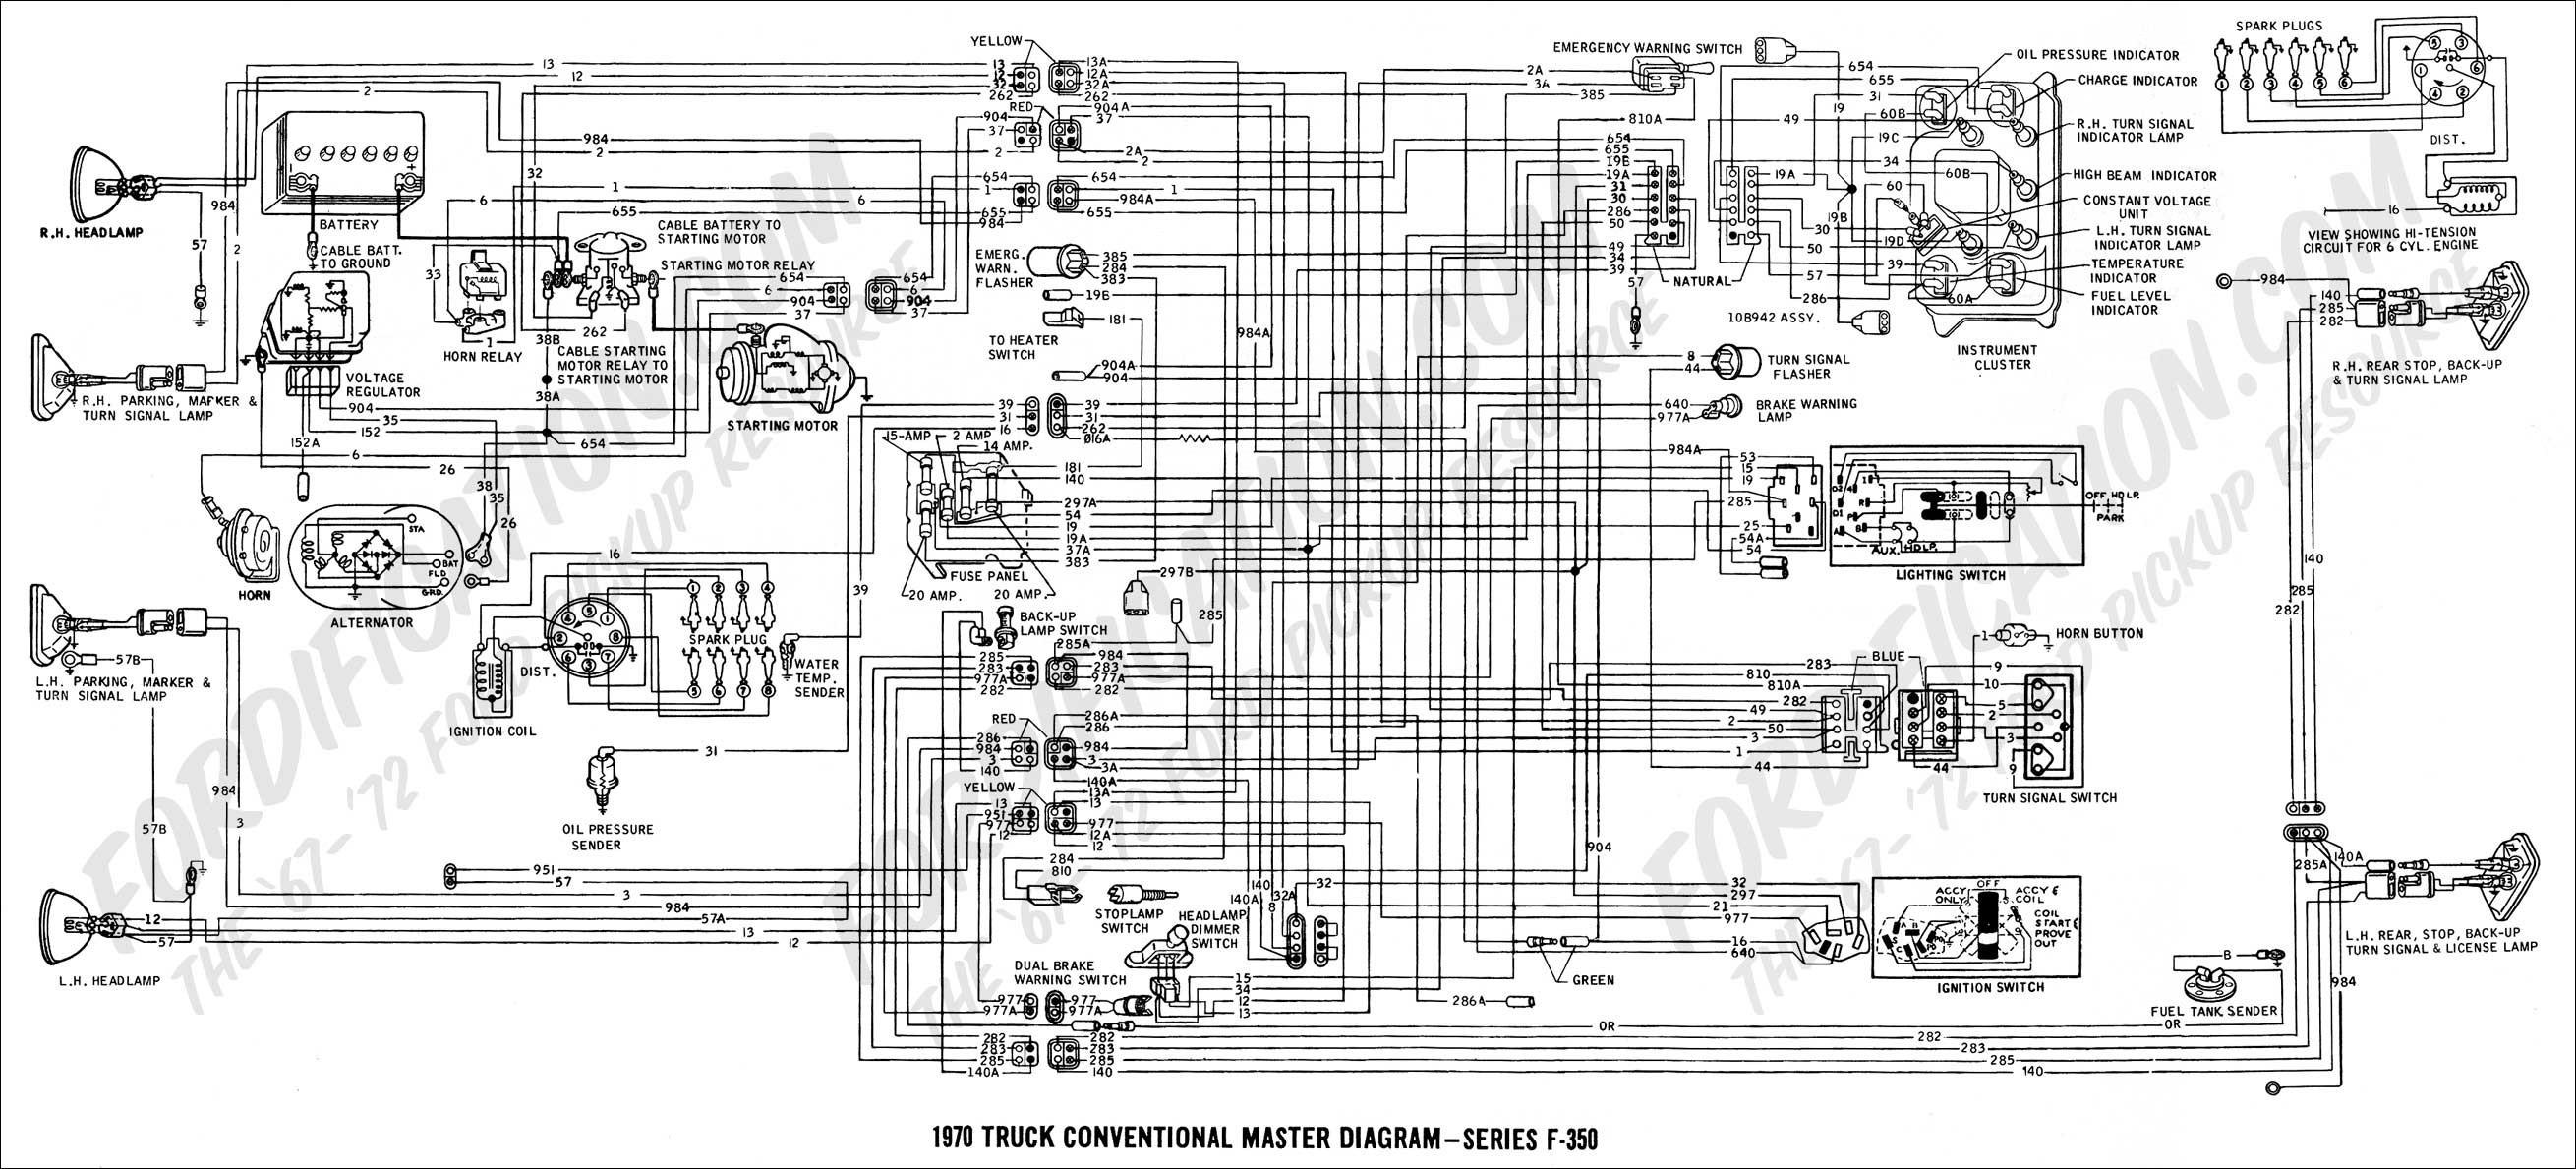 1999 f250 engine diagram - wiring diagrams post bike-indor -  bike-indor.michelegori.it  michelegori.it